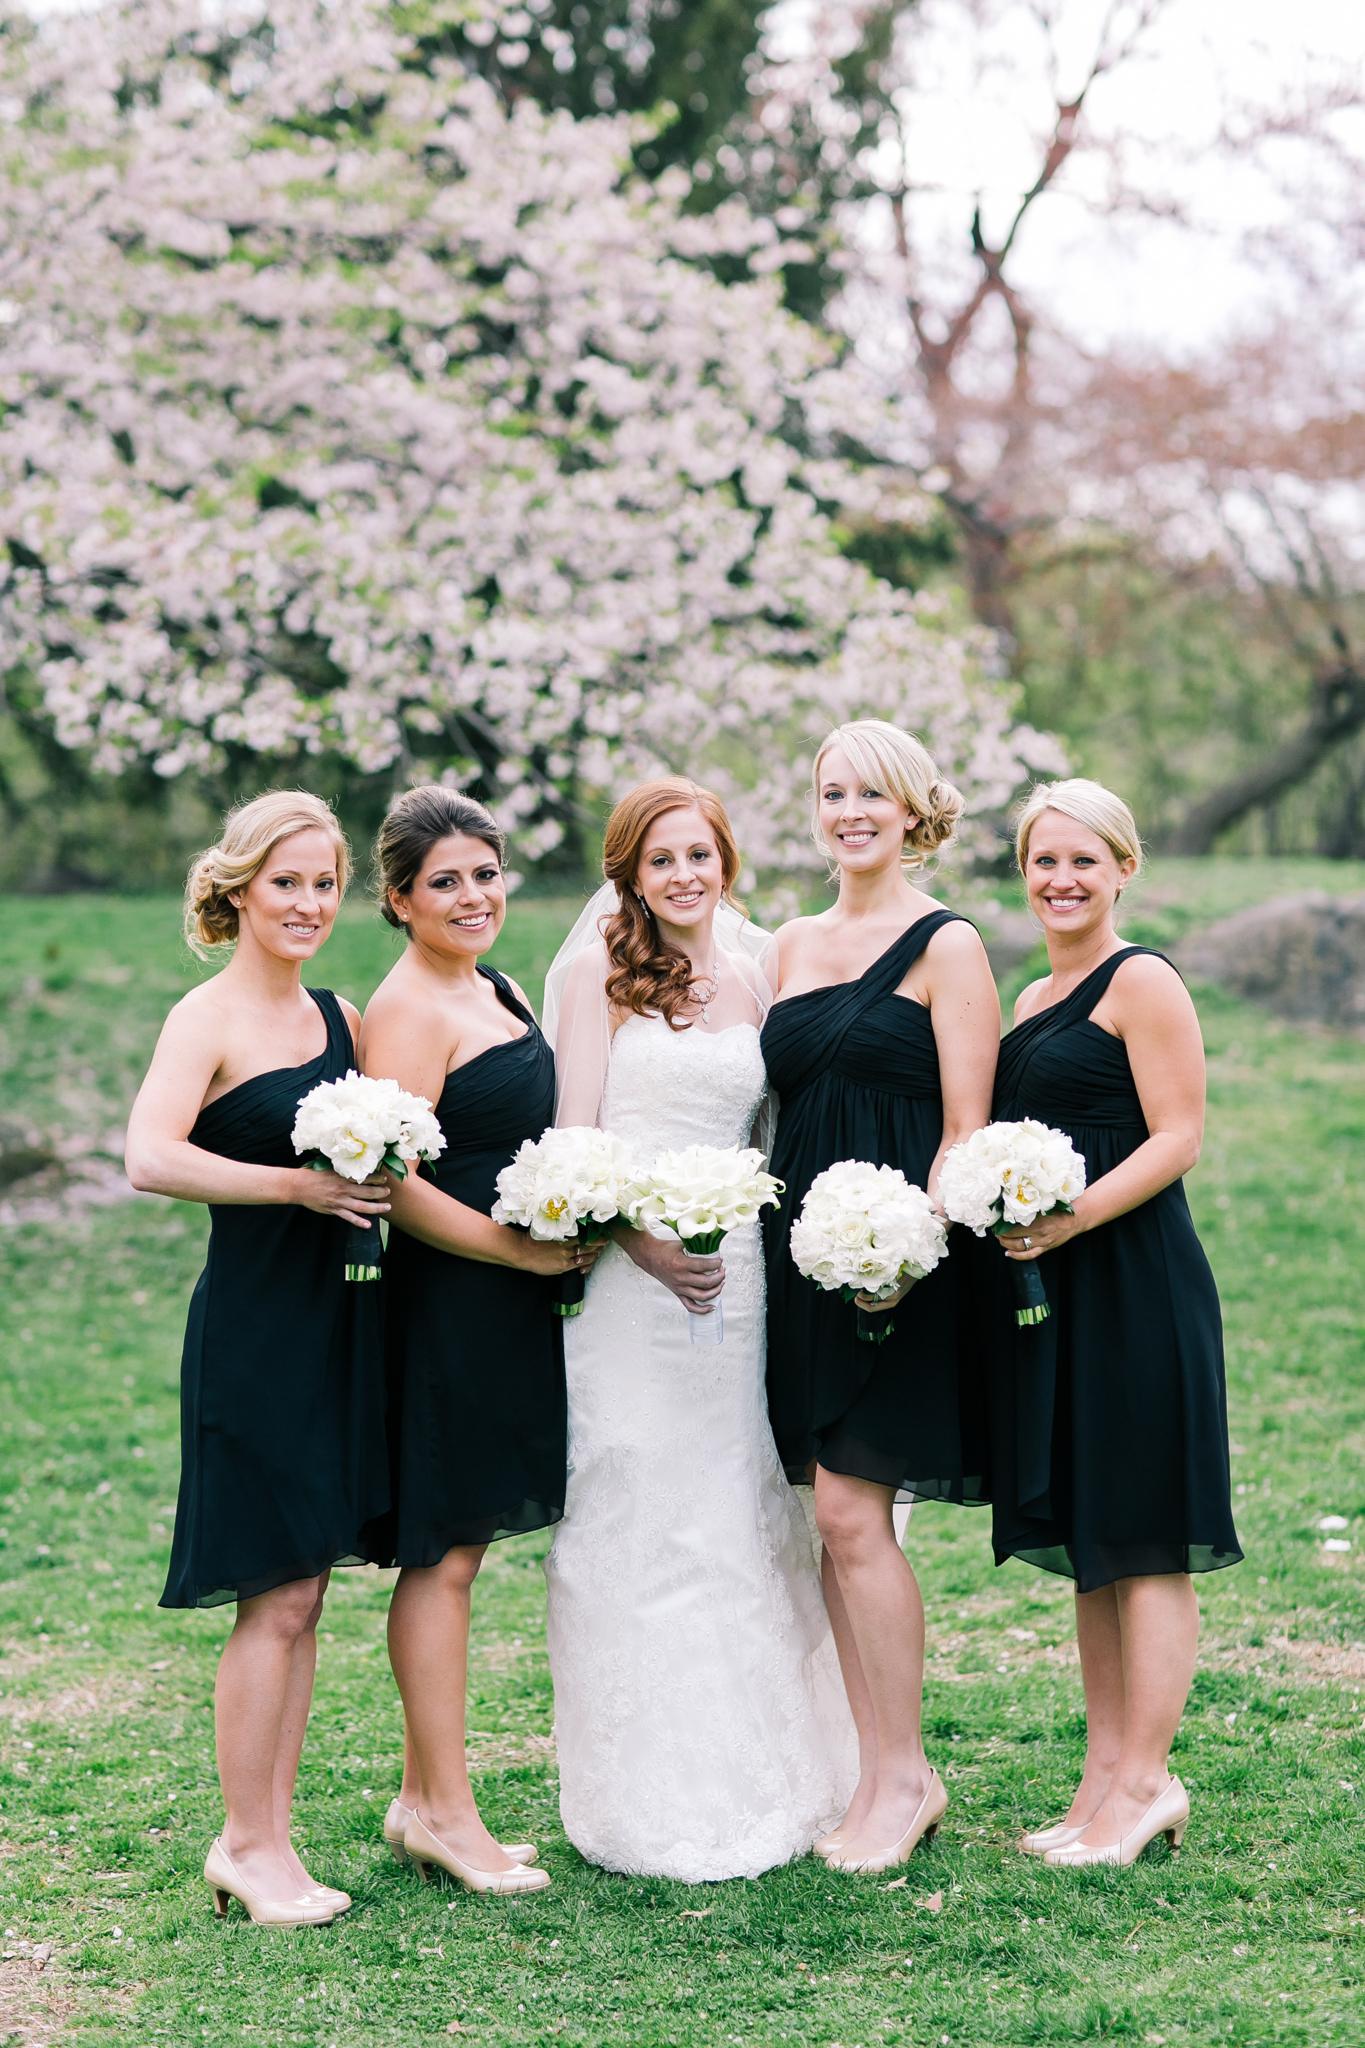 Black One Shoulder Bridesmaids Dresses